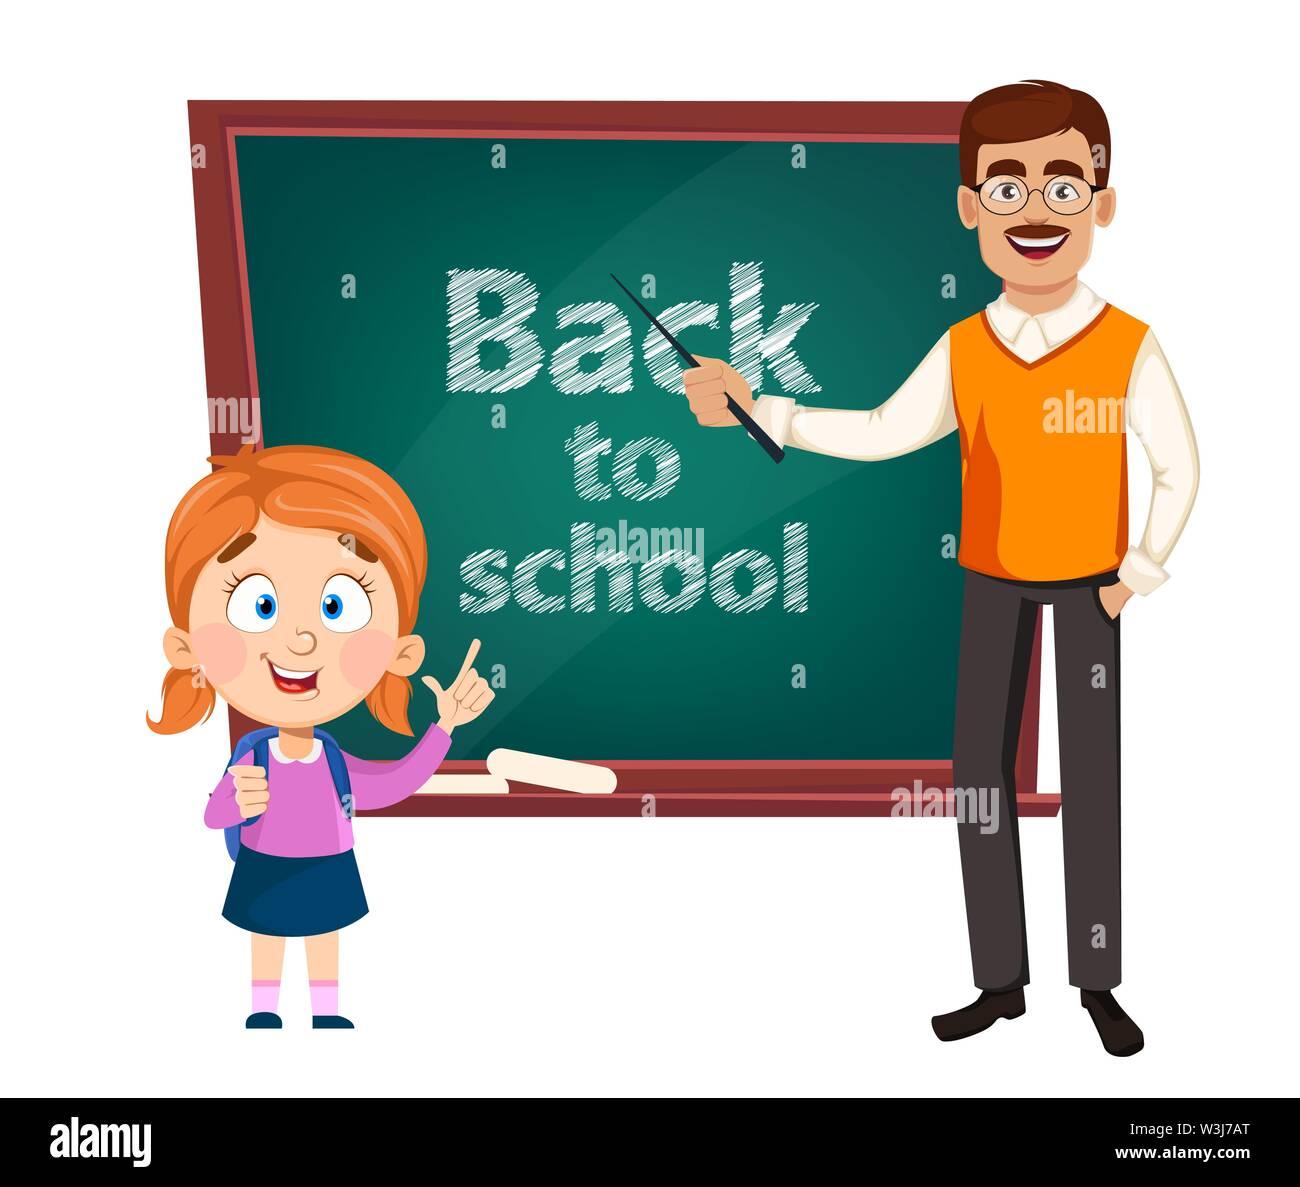 Back to school. Teacher man cartoon character and cute schoolgirl. Teacher's day. Vector illustration - Stock Image